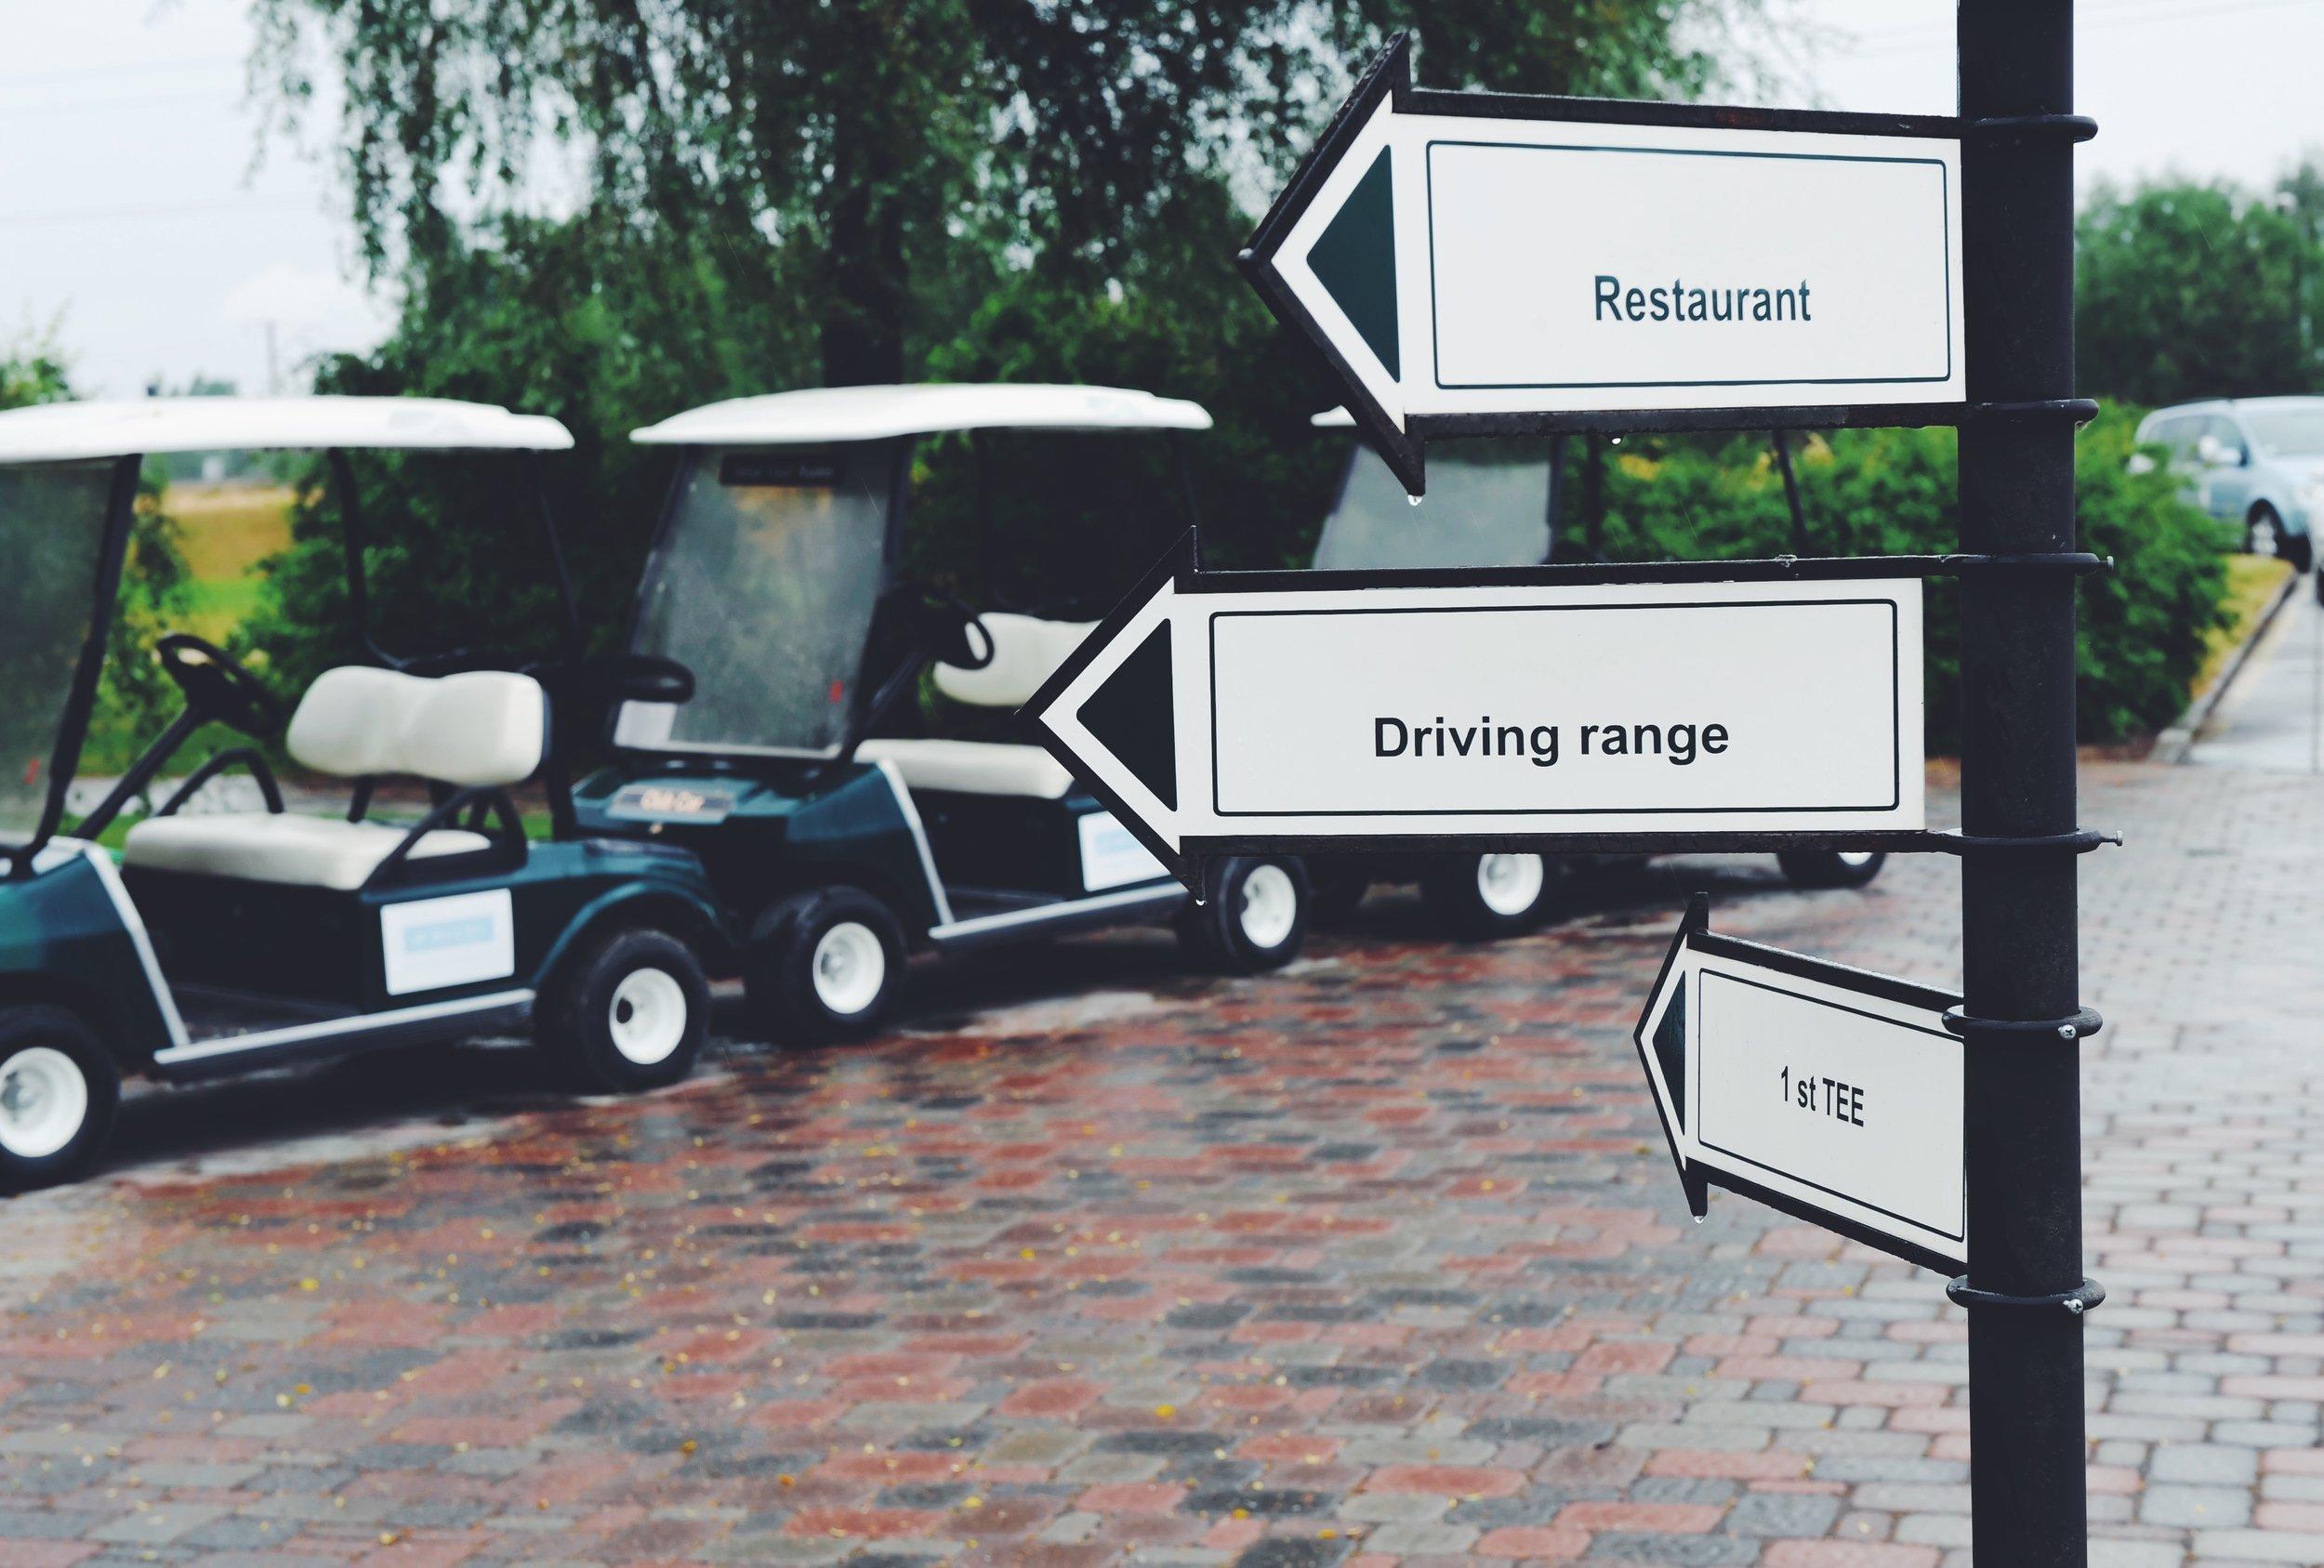 Golfclubrestaurantdriving.jpeg